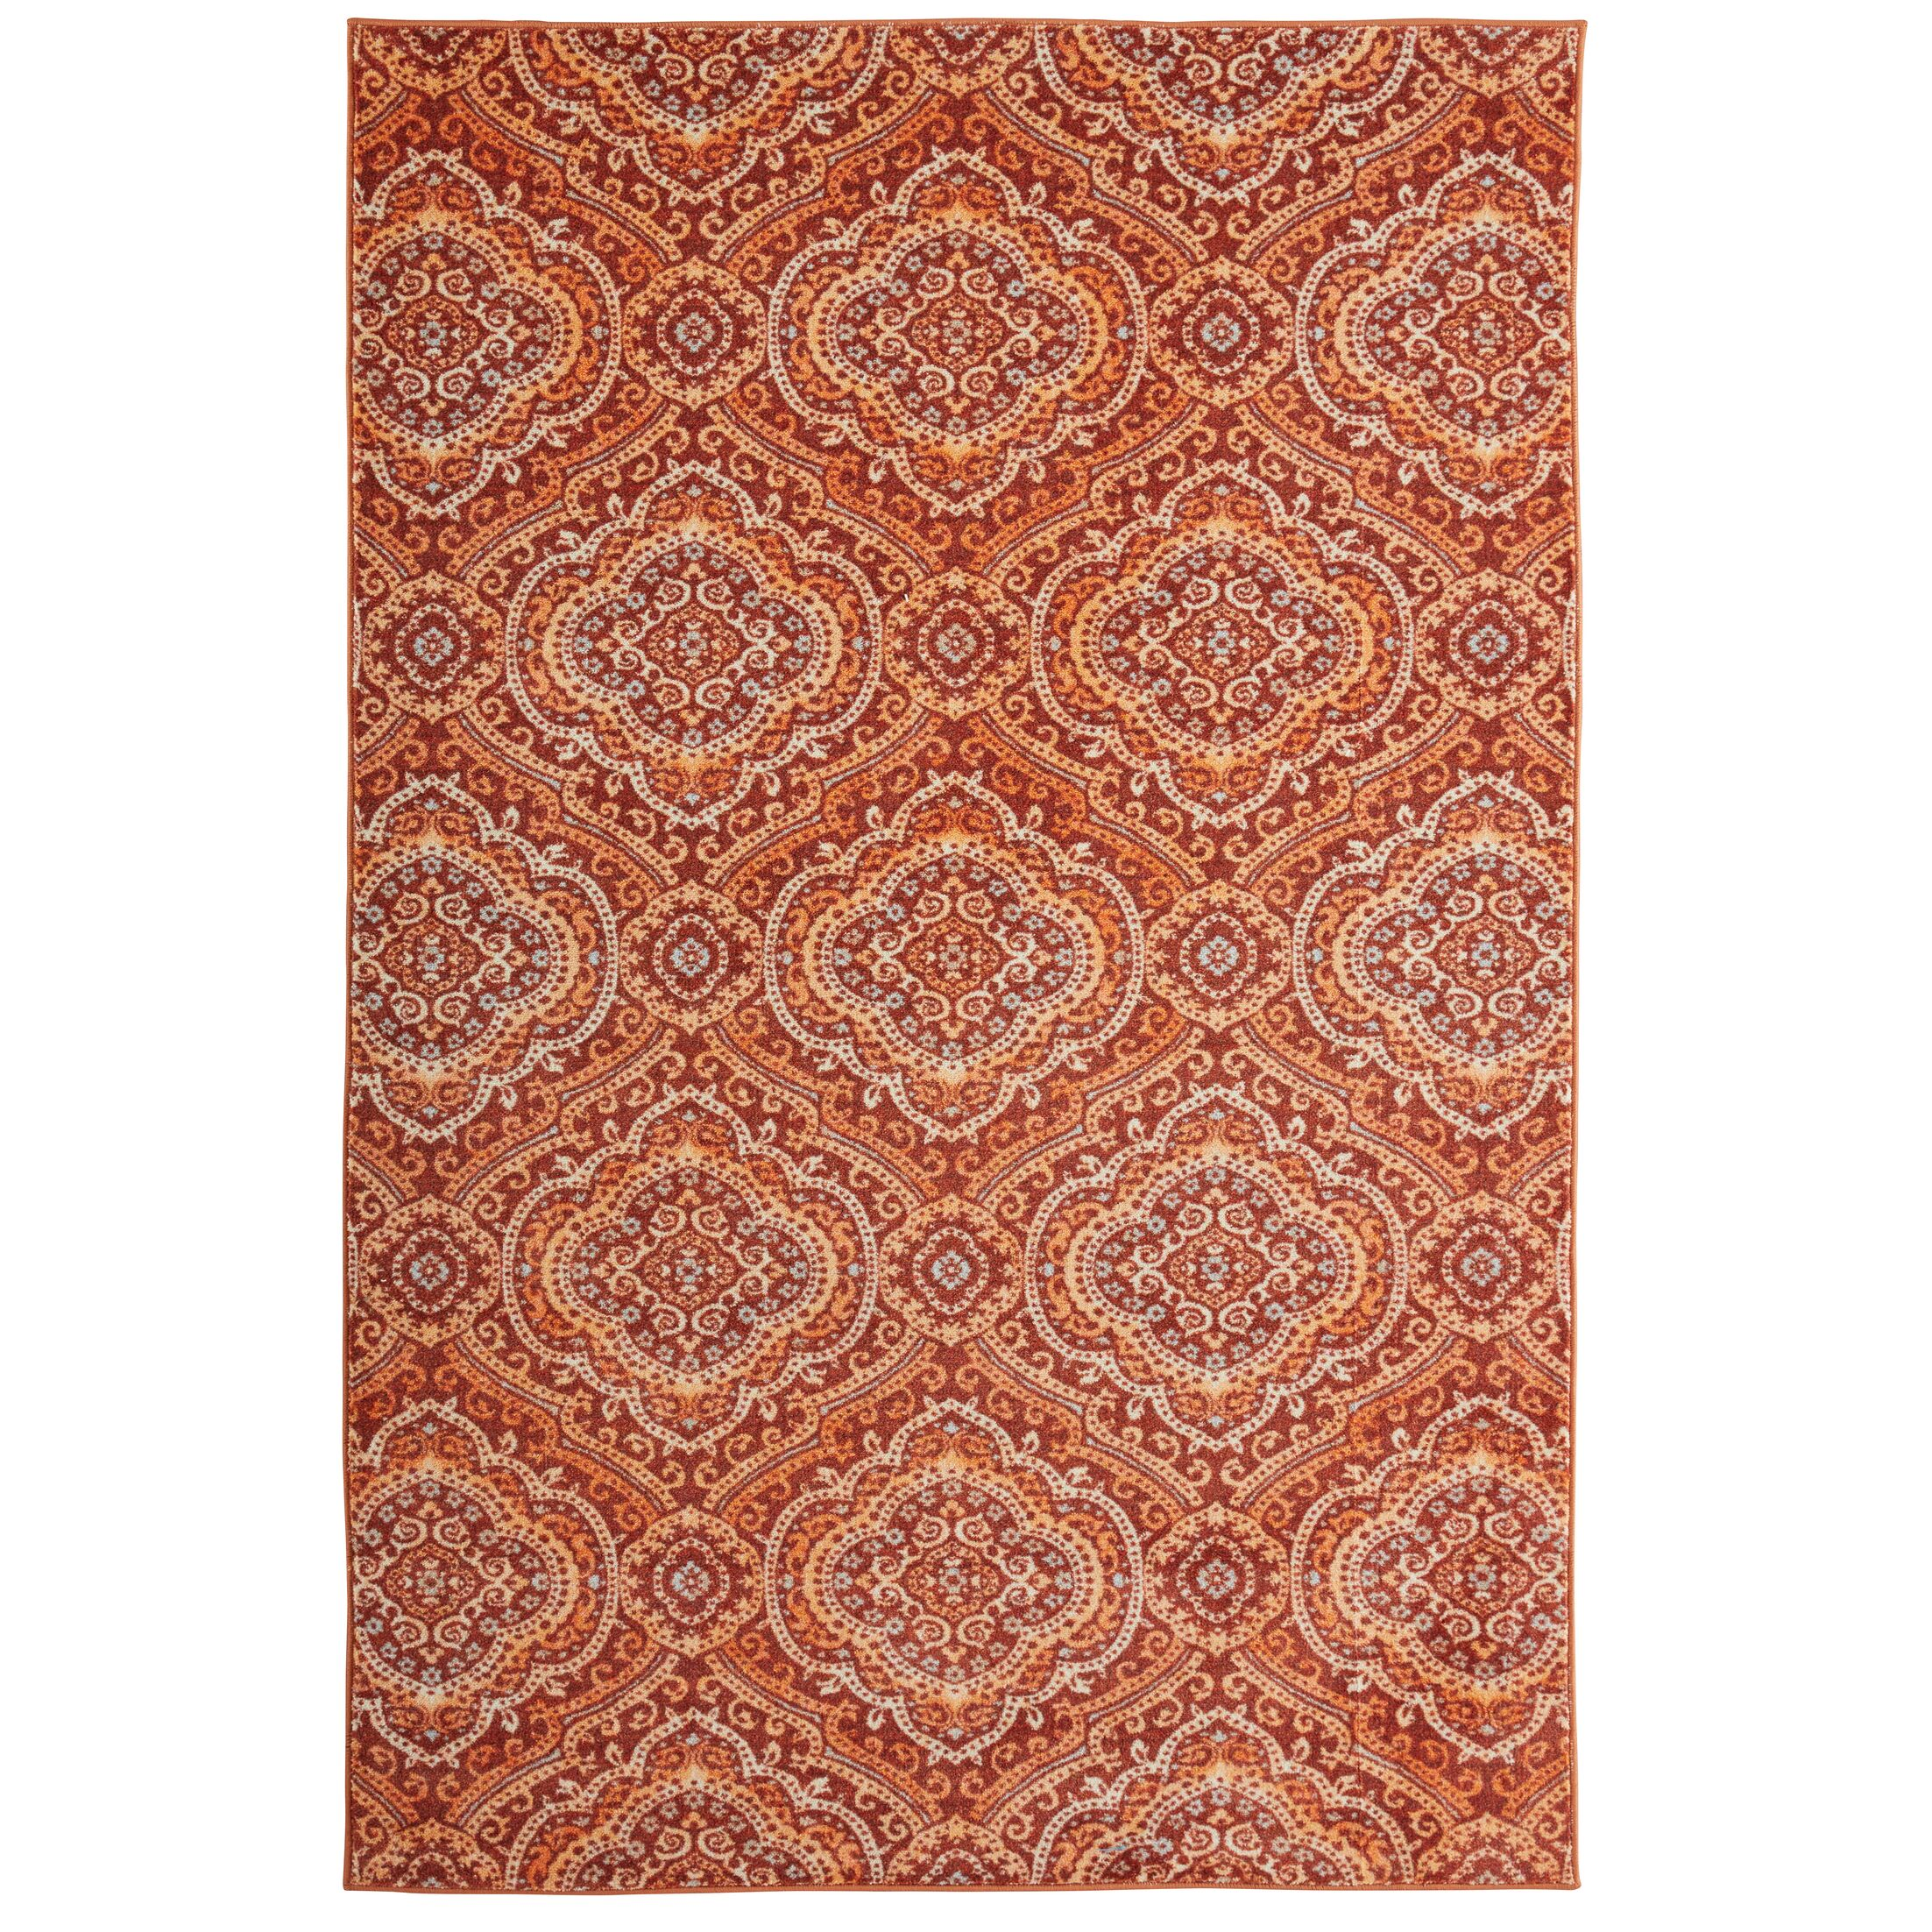 Amblewood Burnt Orange Area Rug Rug Size: Rectangle 5' x 8'